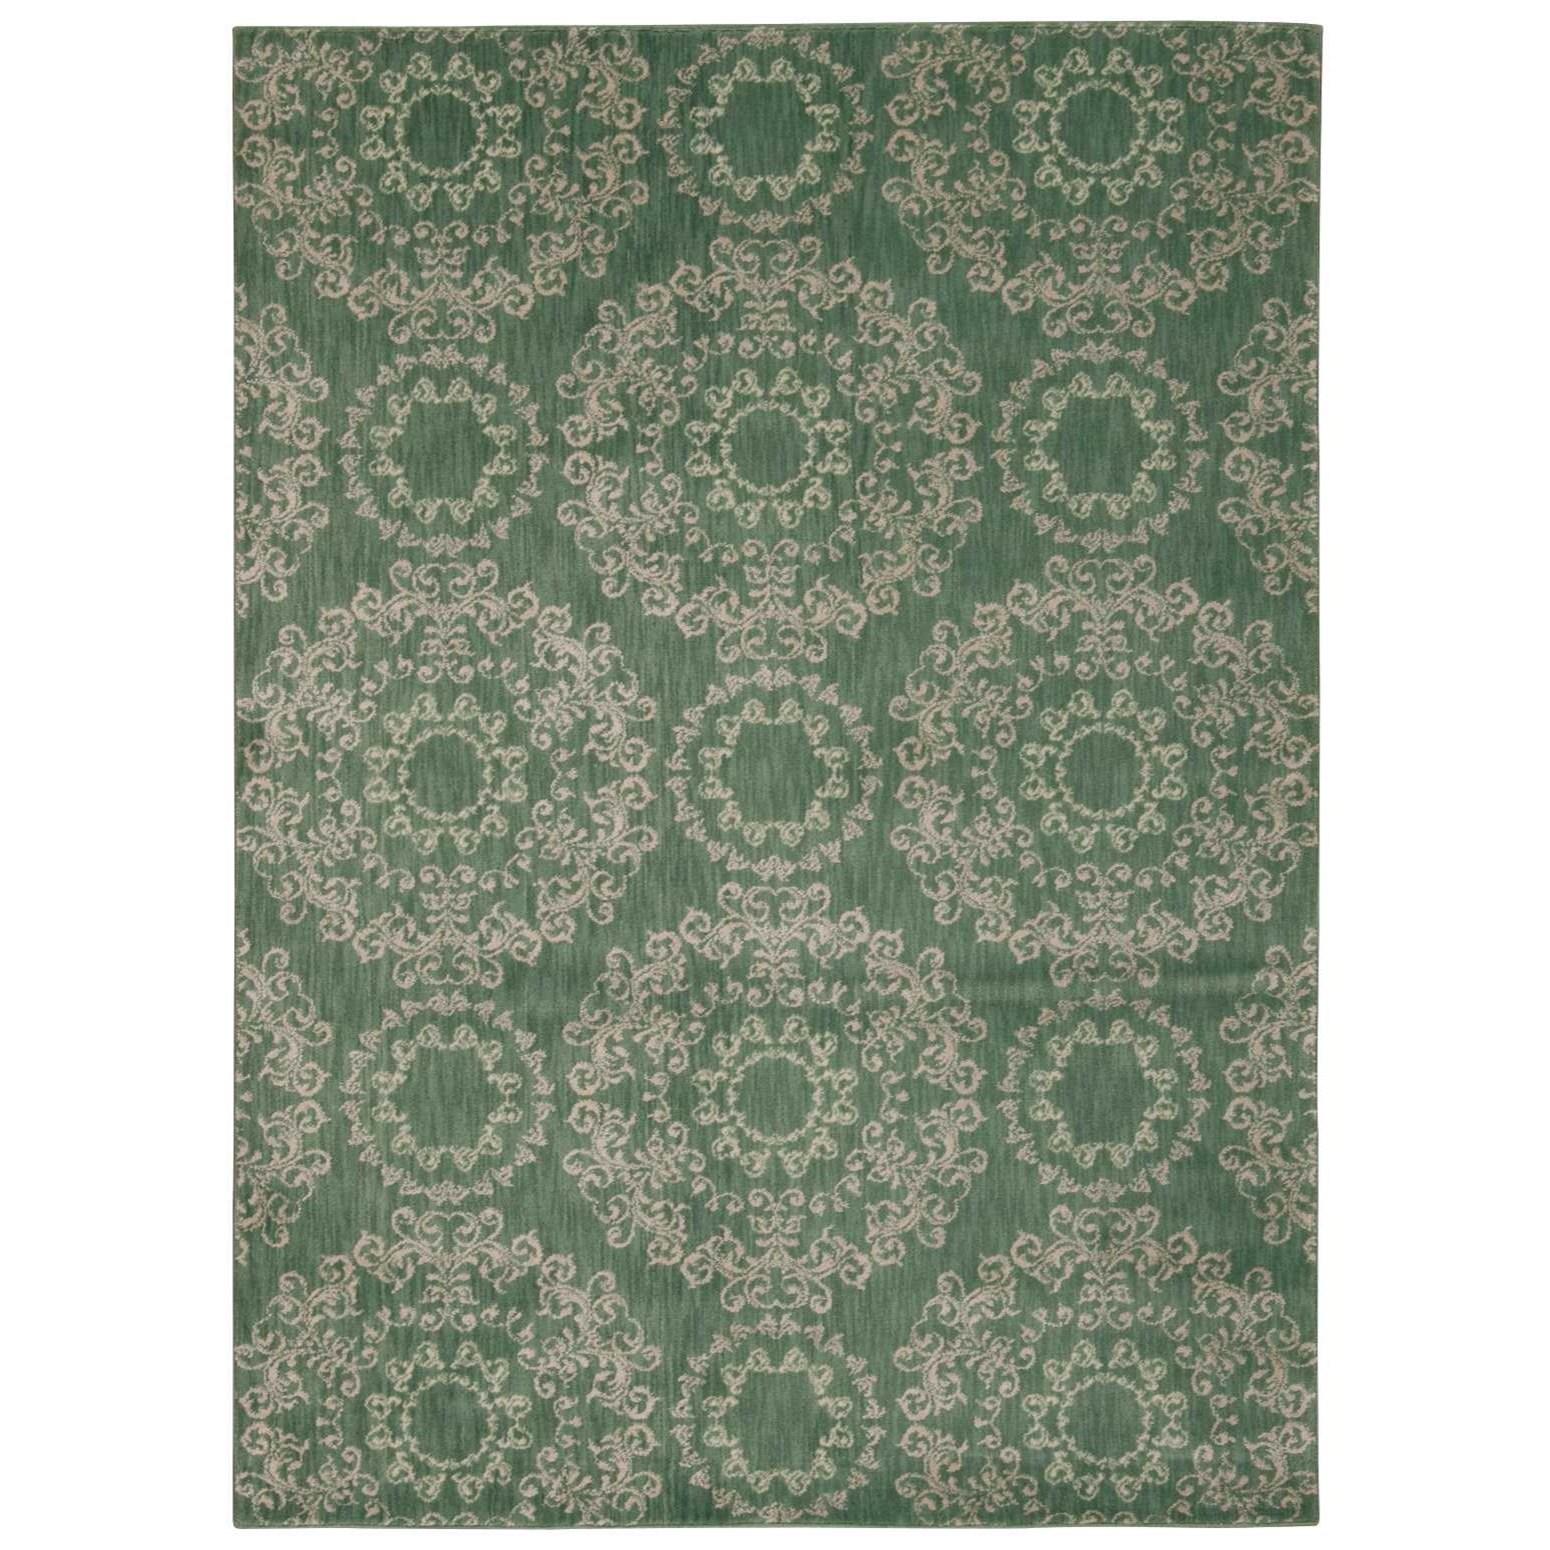 "Nourison Tranquility 3'9"" x 5'9"" Light Green Rectangle Rug - Item Number: TNQ03 LTG 39X59"